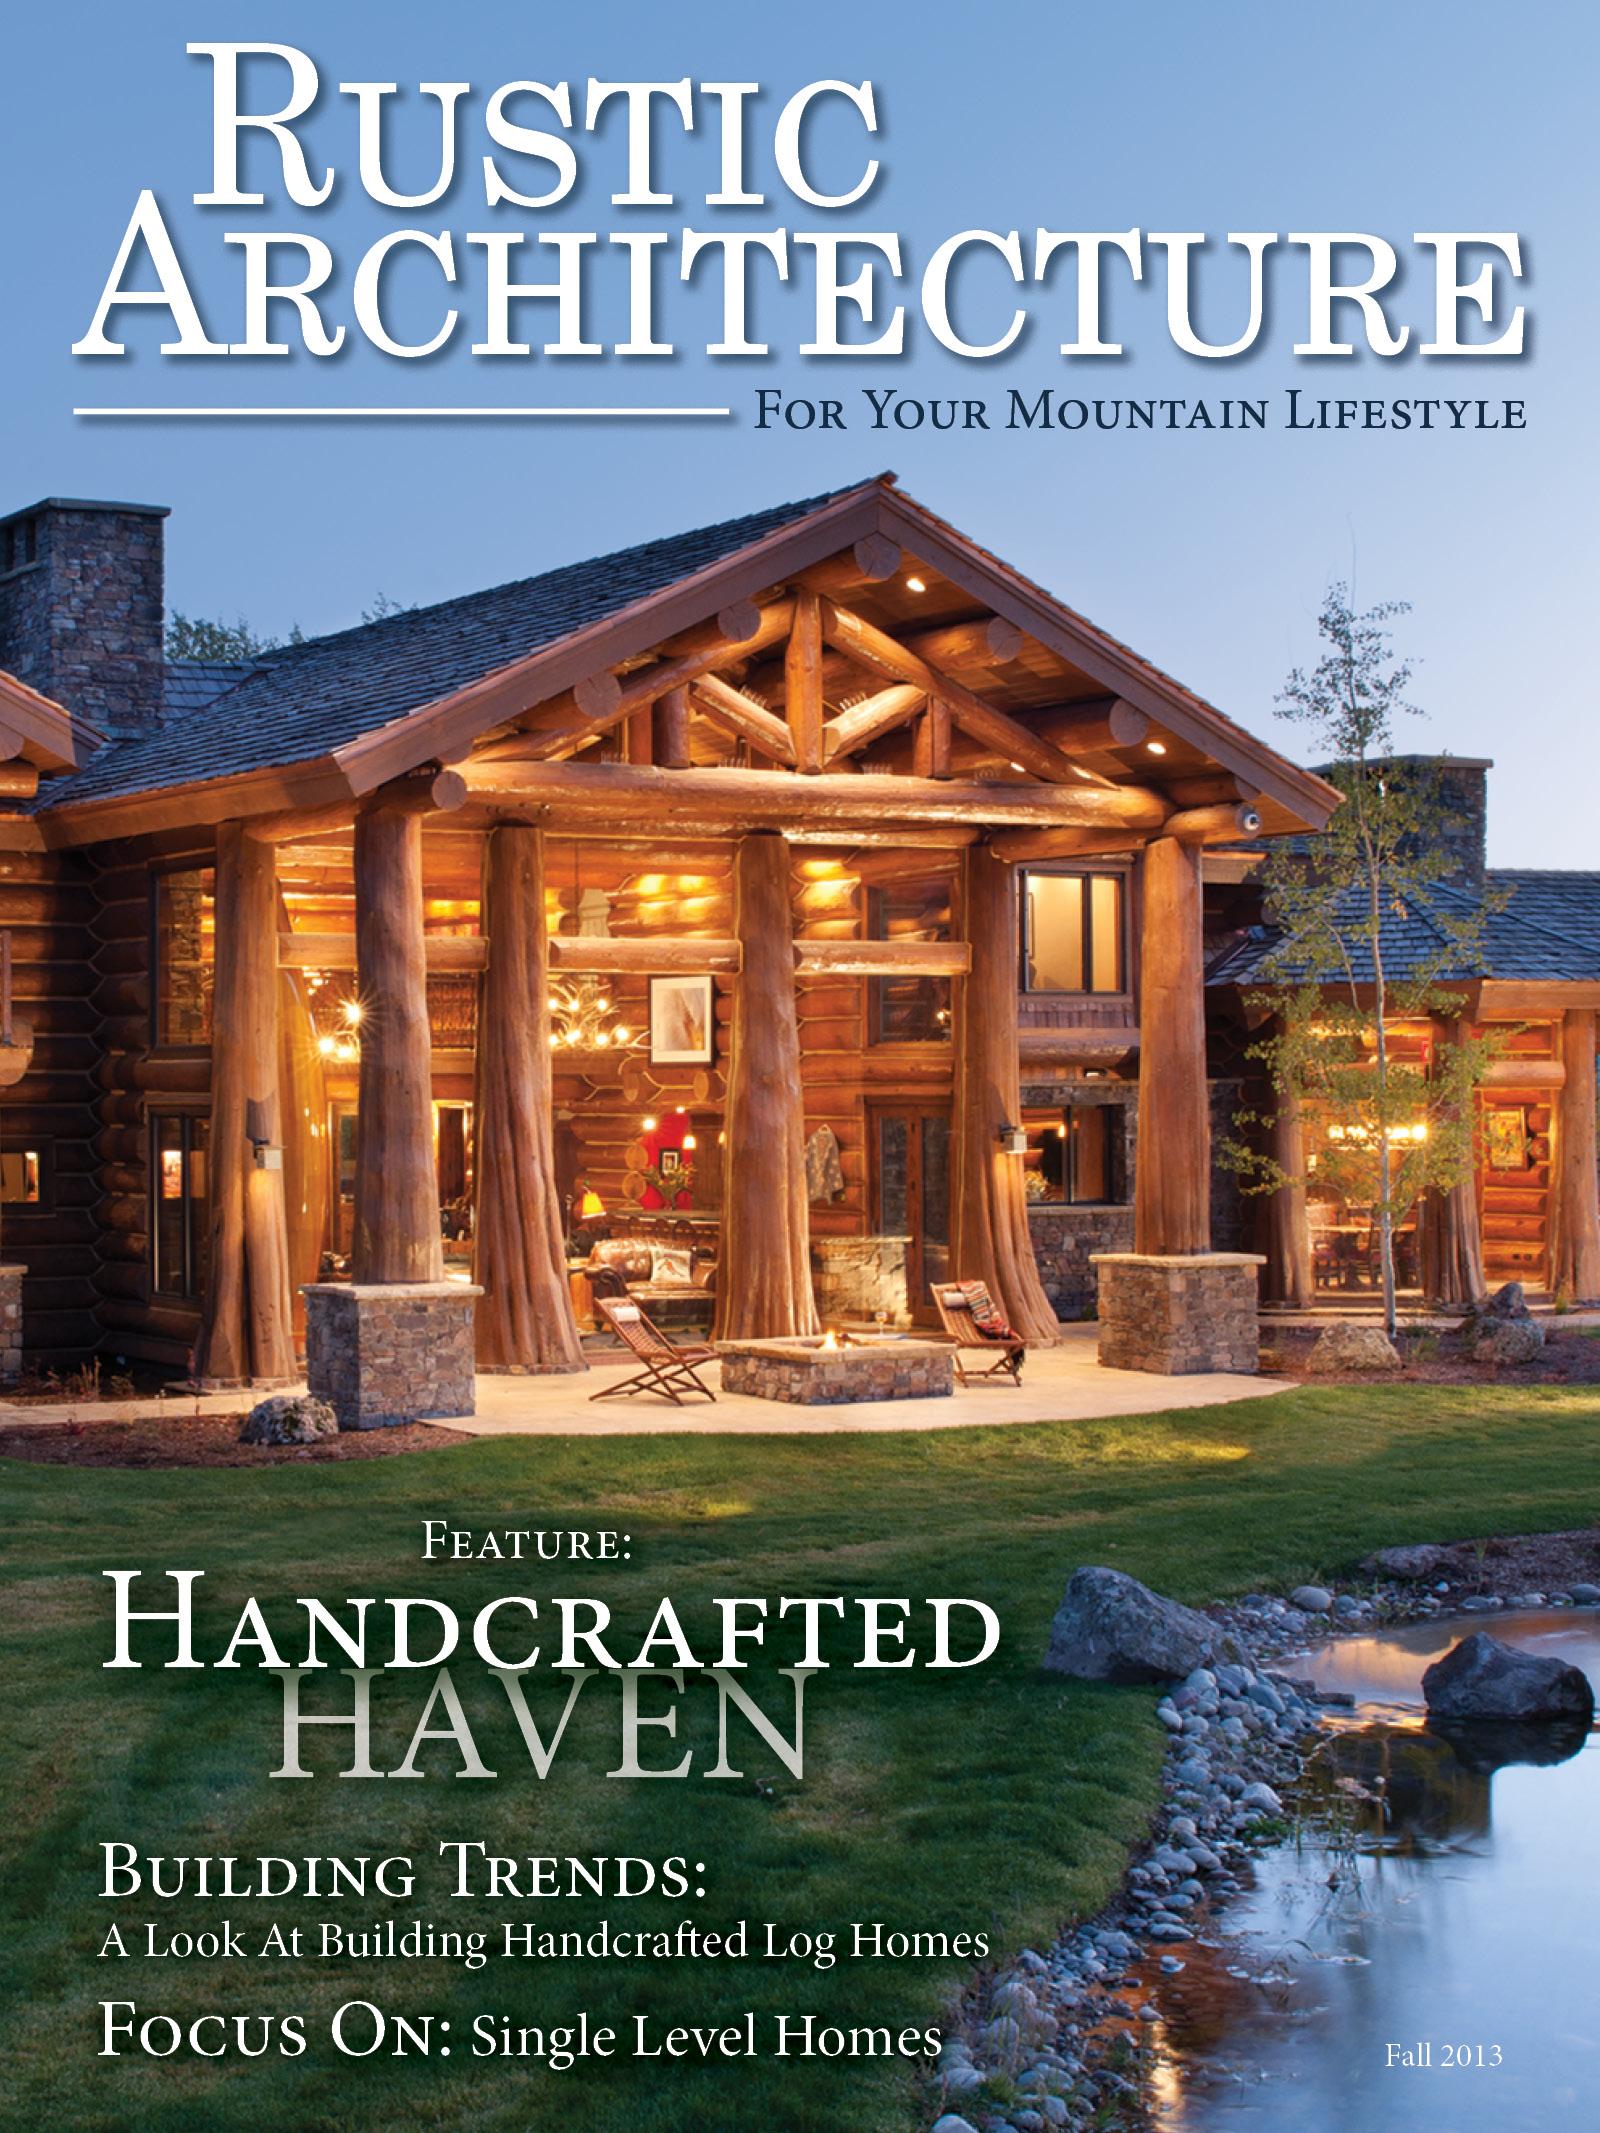 PFB Custom Homes Introduces Rustic Architecture Magazine